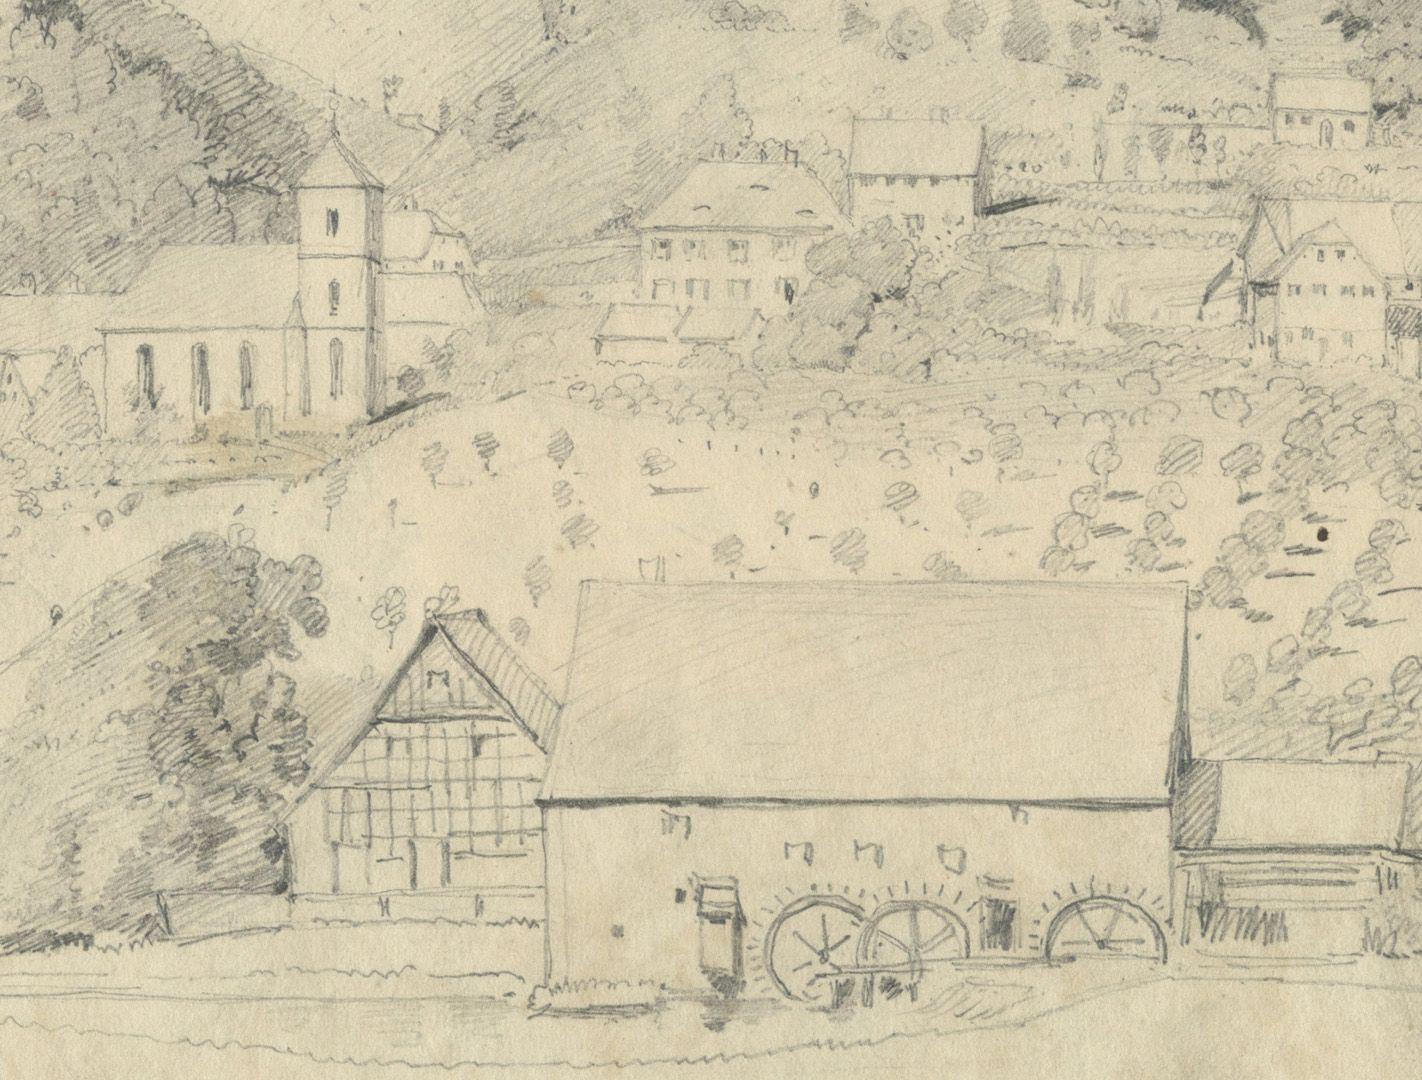 Sketchbook with views of Streitberg and Neideck / incl. Hallerweiherhaus in Nuremberg Picture Streitberg, detail